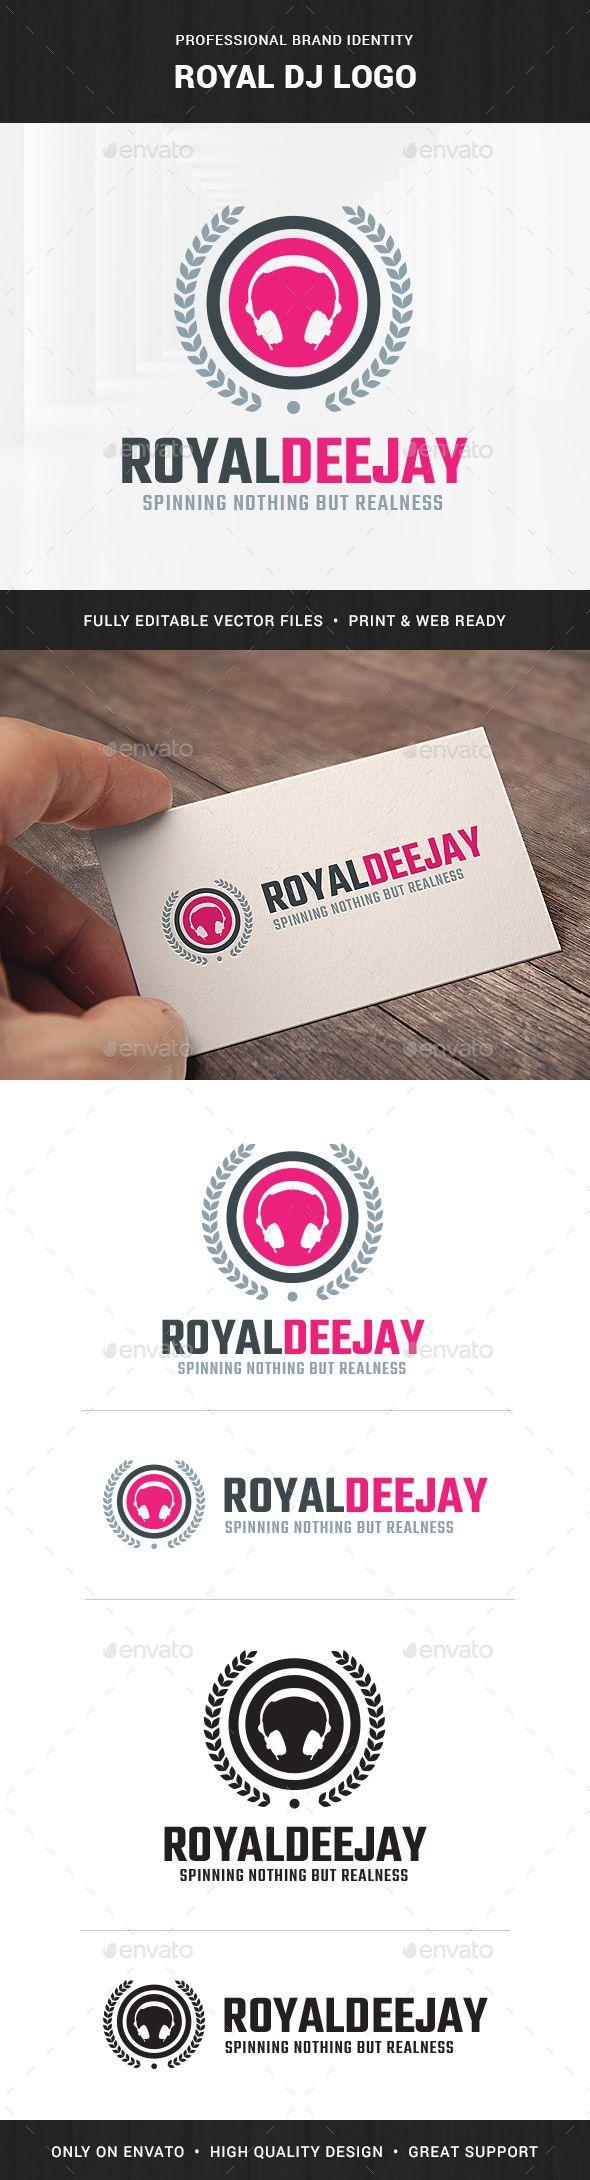 Royal DJ Logo Template v2